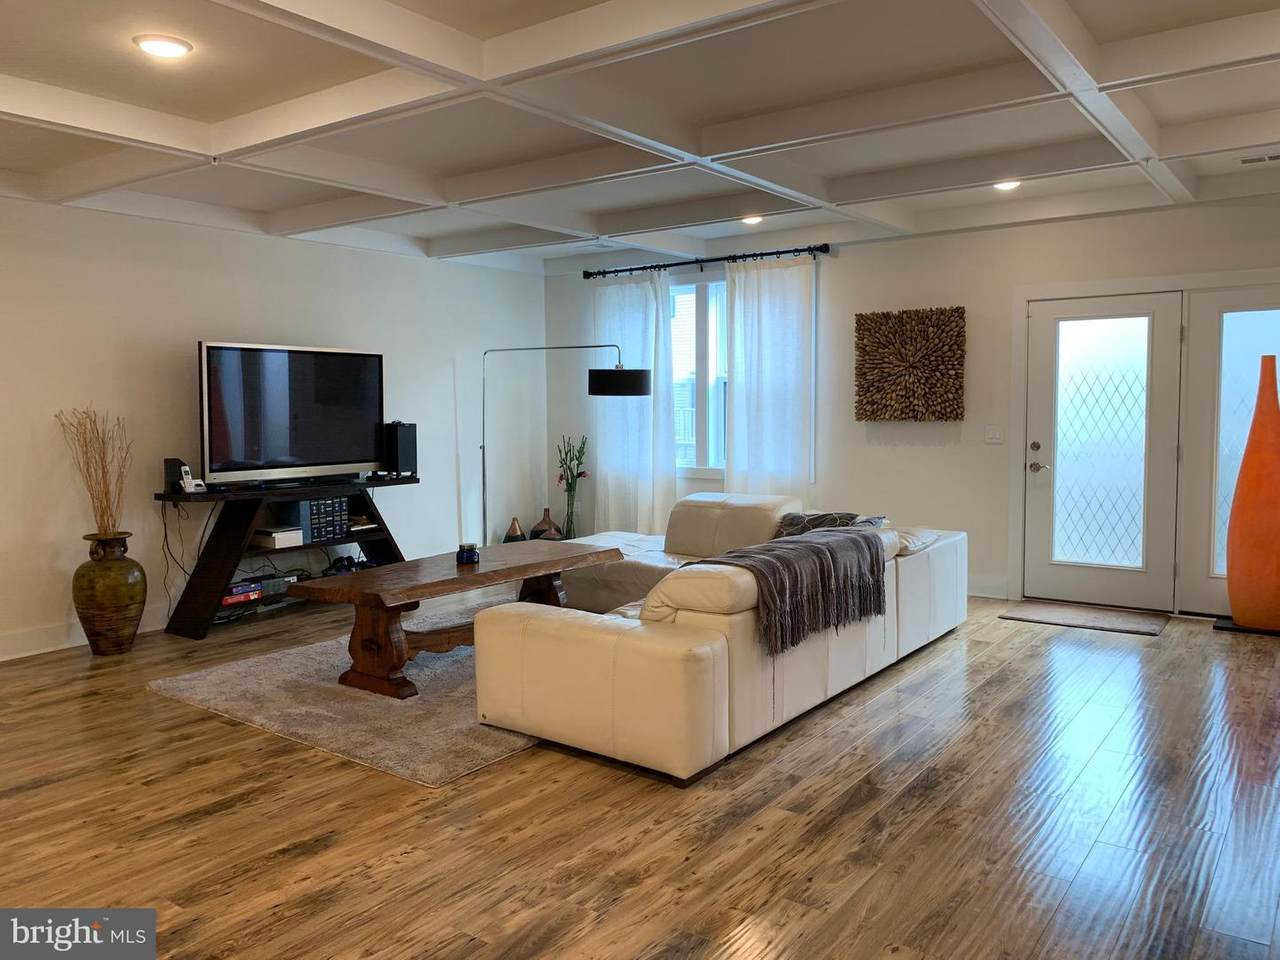 20496 Milbridge Terrace - Photo 1